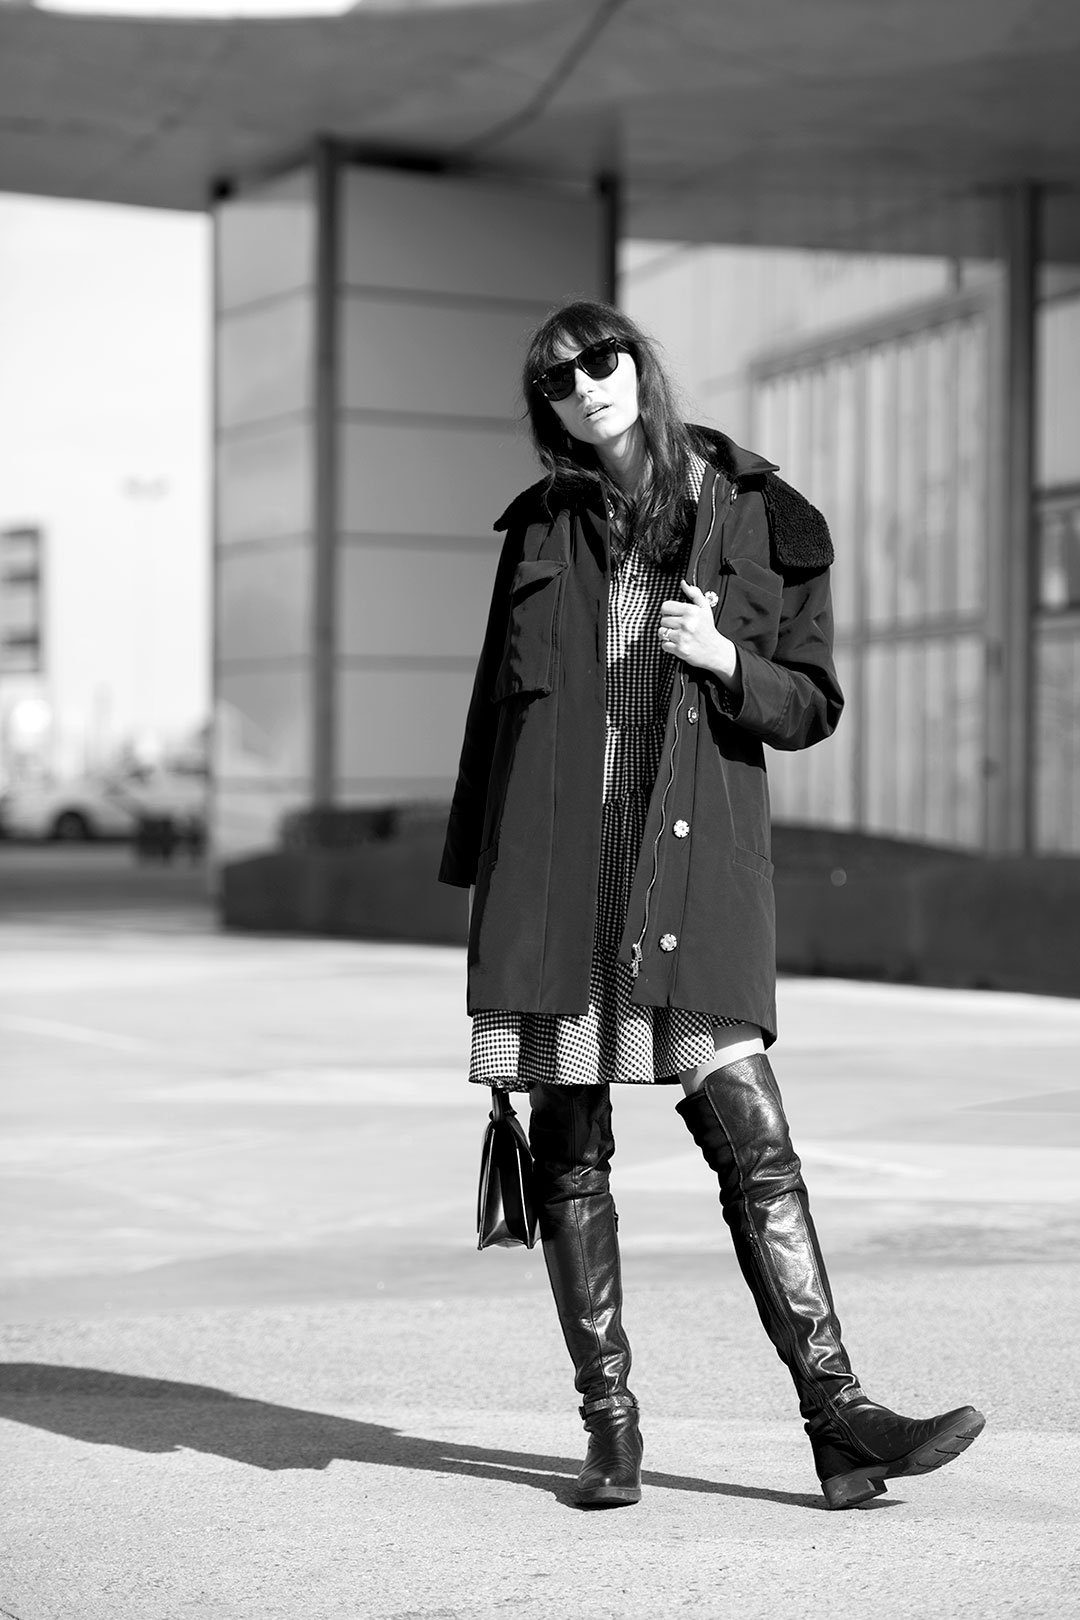 mbfwm-black-and-white-street-style-mitmeblog-bn-web-07